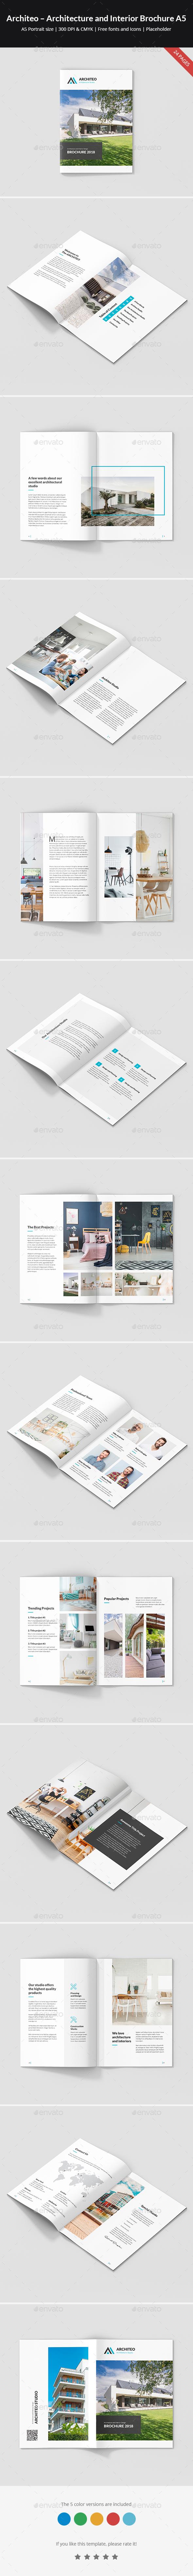 Architeo – Architecture and Interior Brochure A5 - Portfolio Brochures